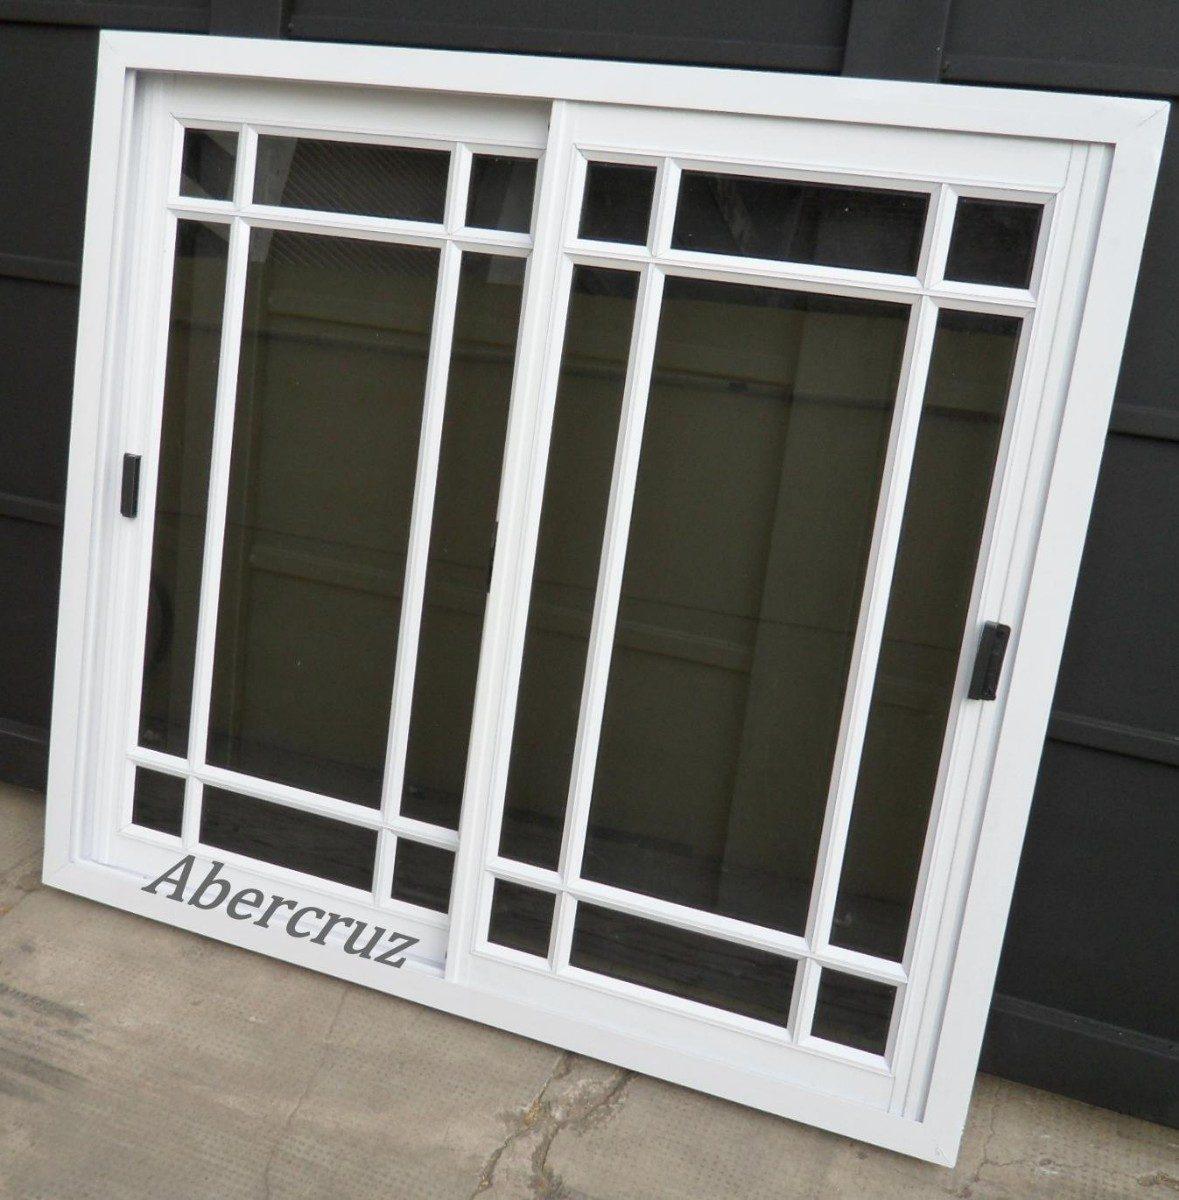 estilos de ventanas francesas google search casa pinterest porch screen enclosures and ideas para